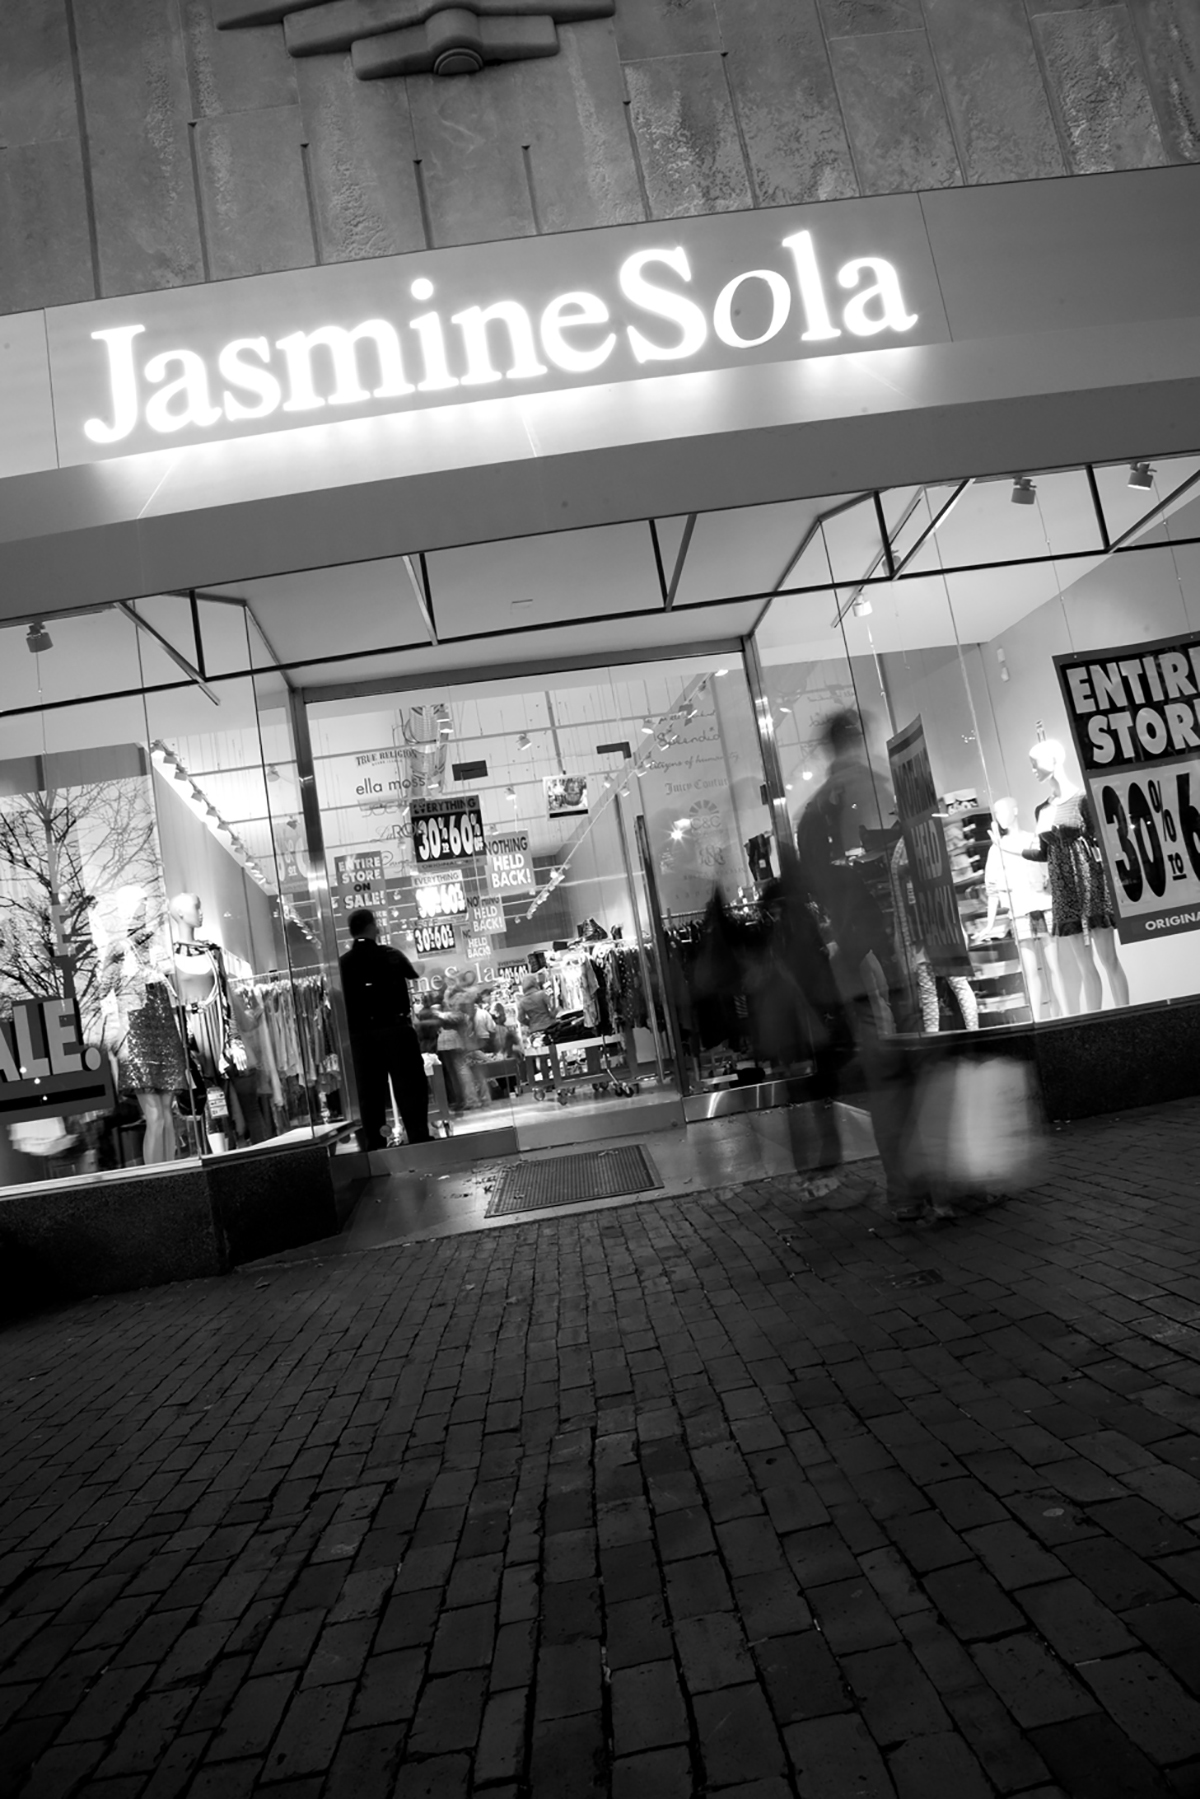 jasmine sola